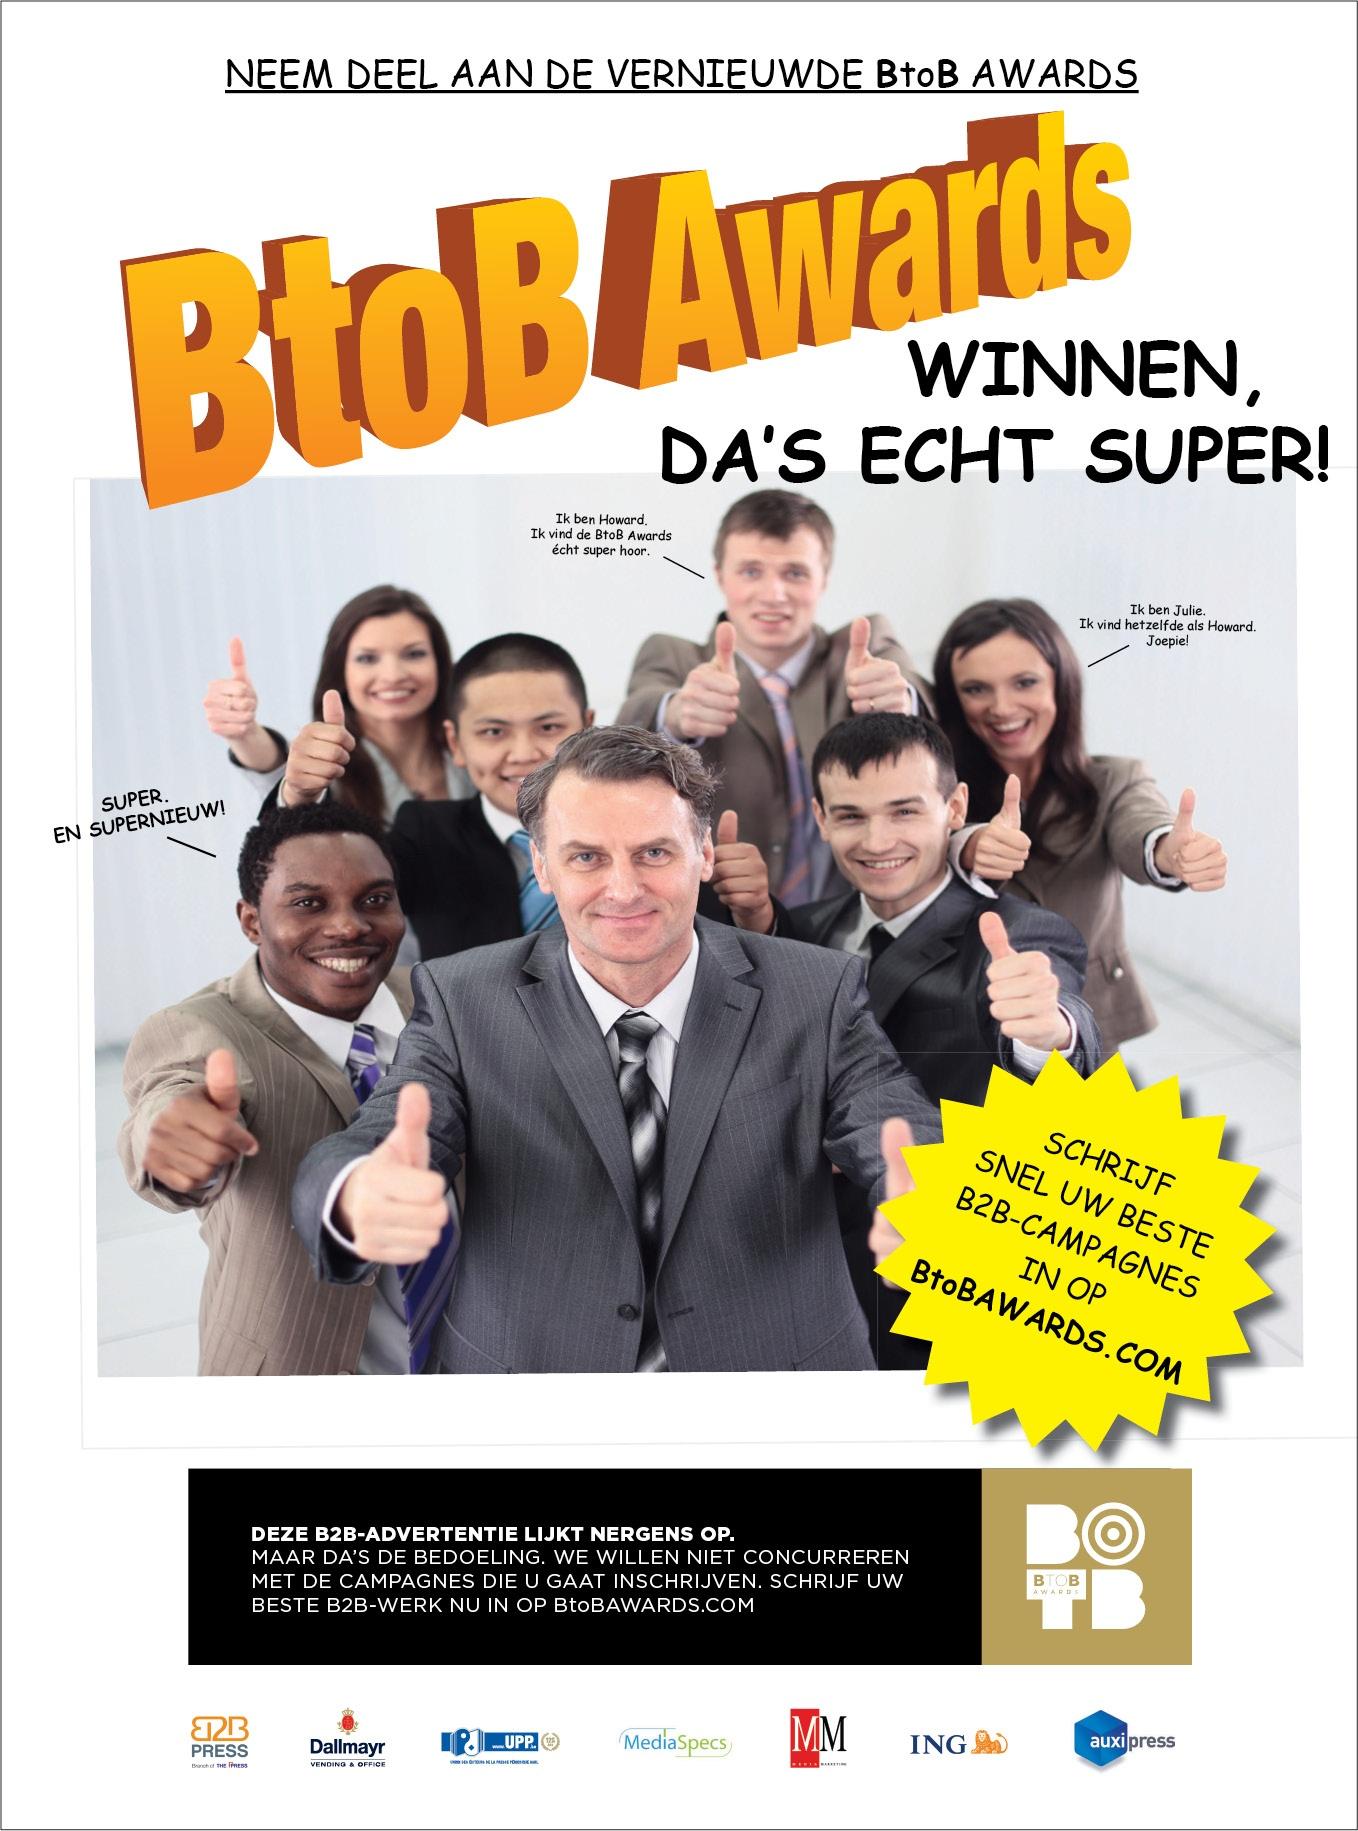 BtoB_Awards_ad_230x310_NL